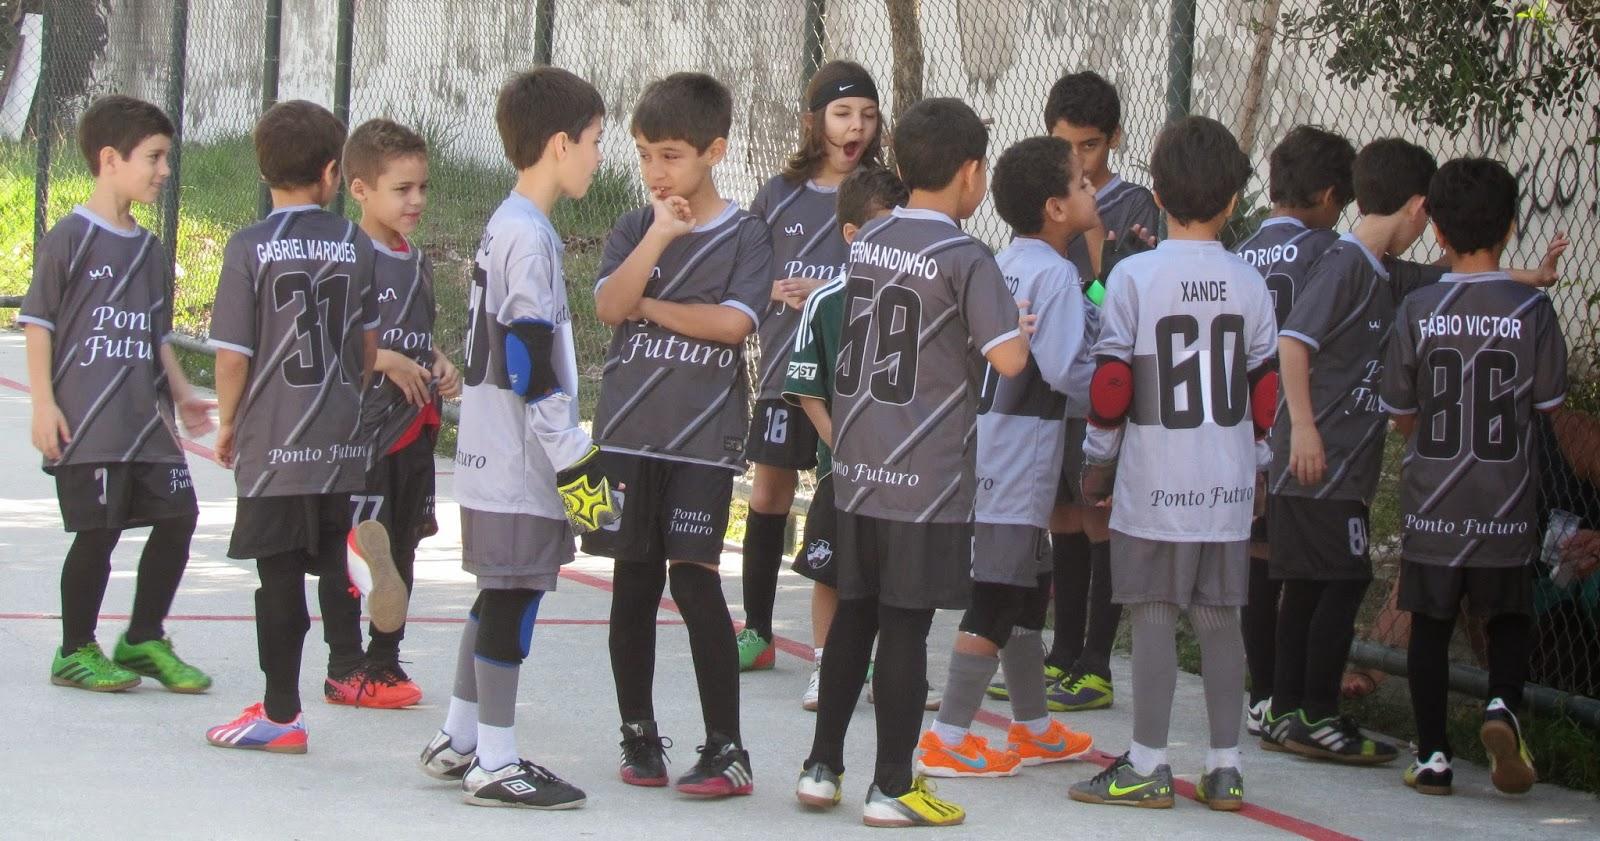 Ponto Futuro Futebol